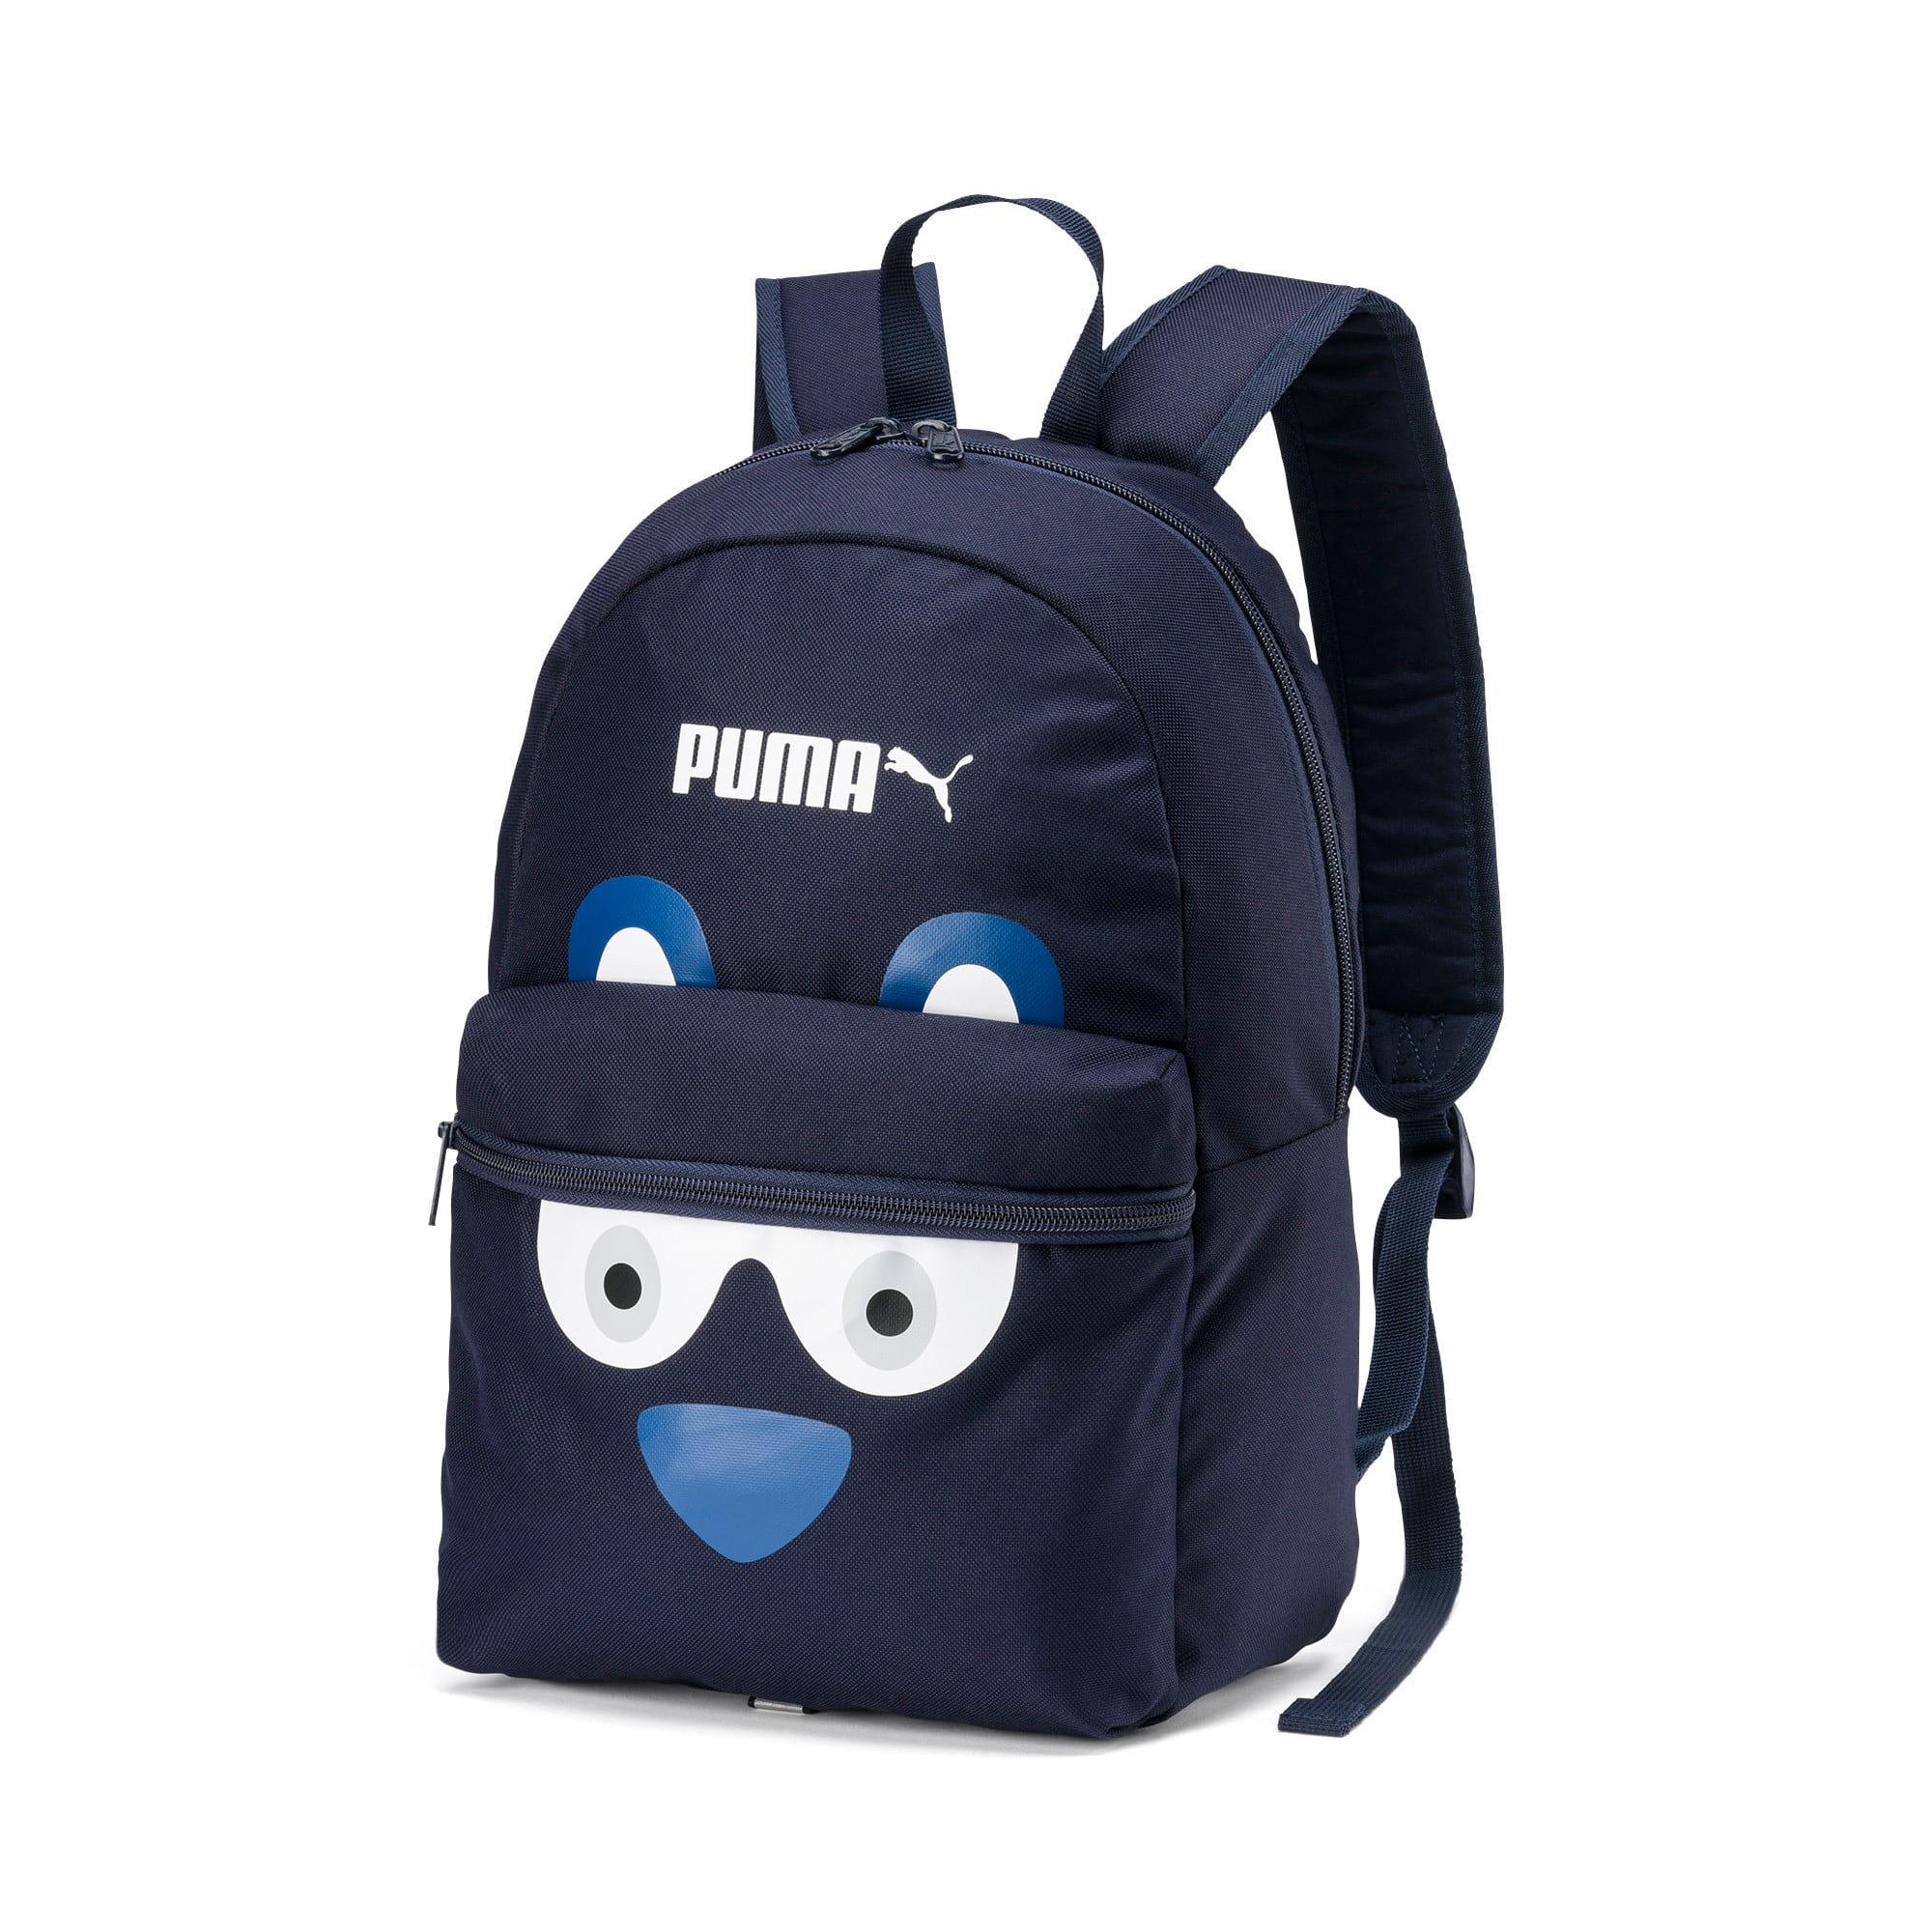 Thumbnail 1 van PUMA Monster rugzak, Nachtblauw, medium